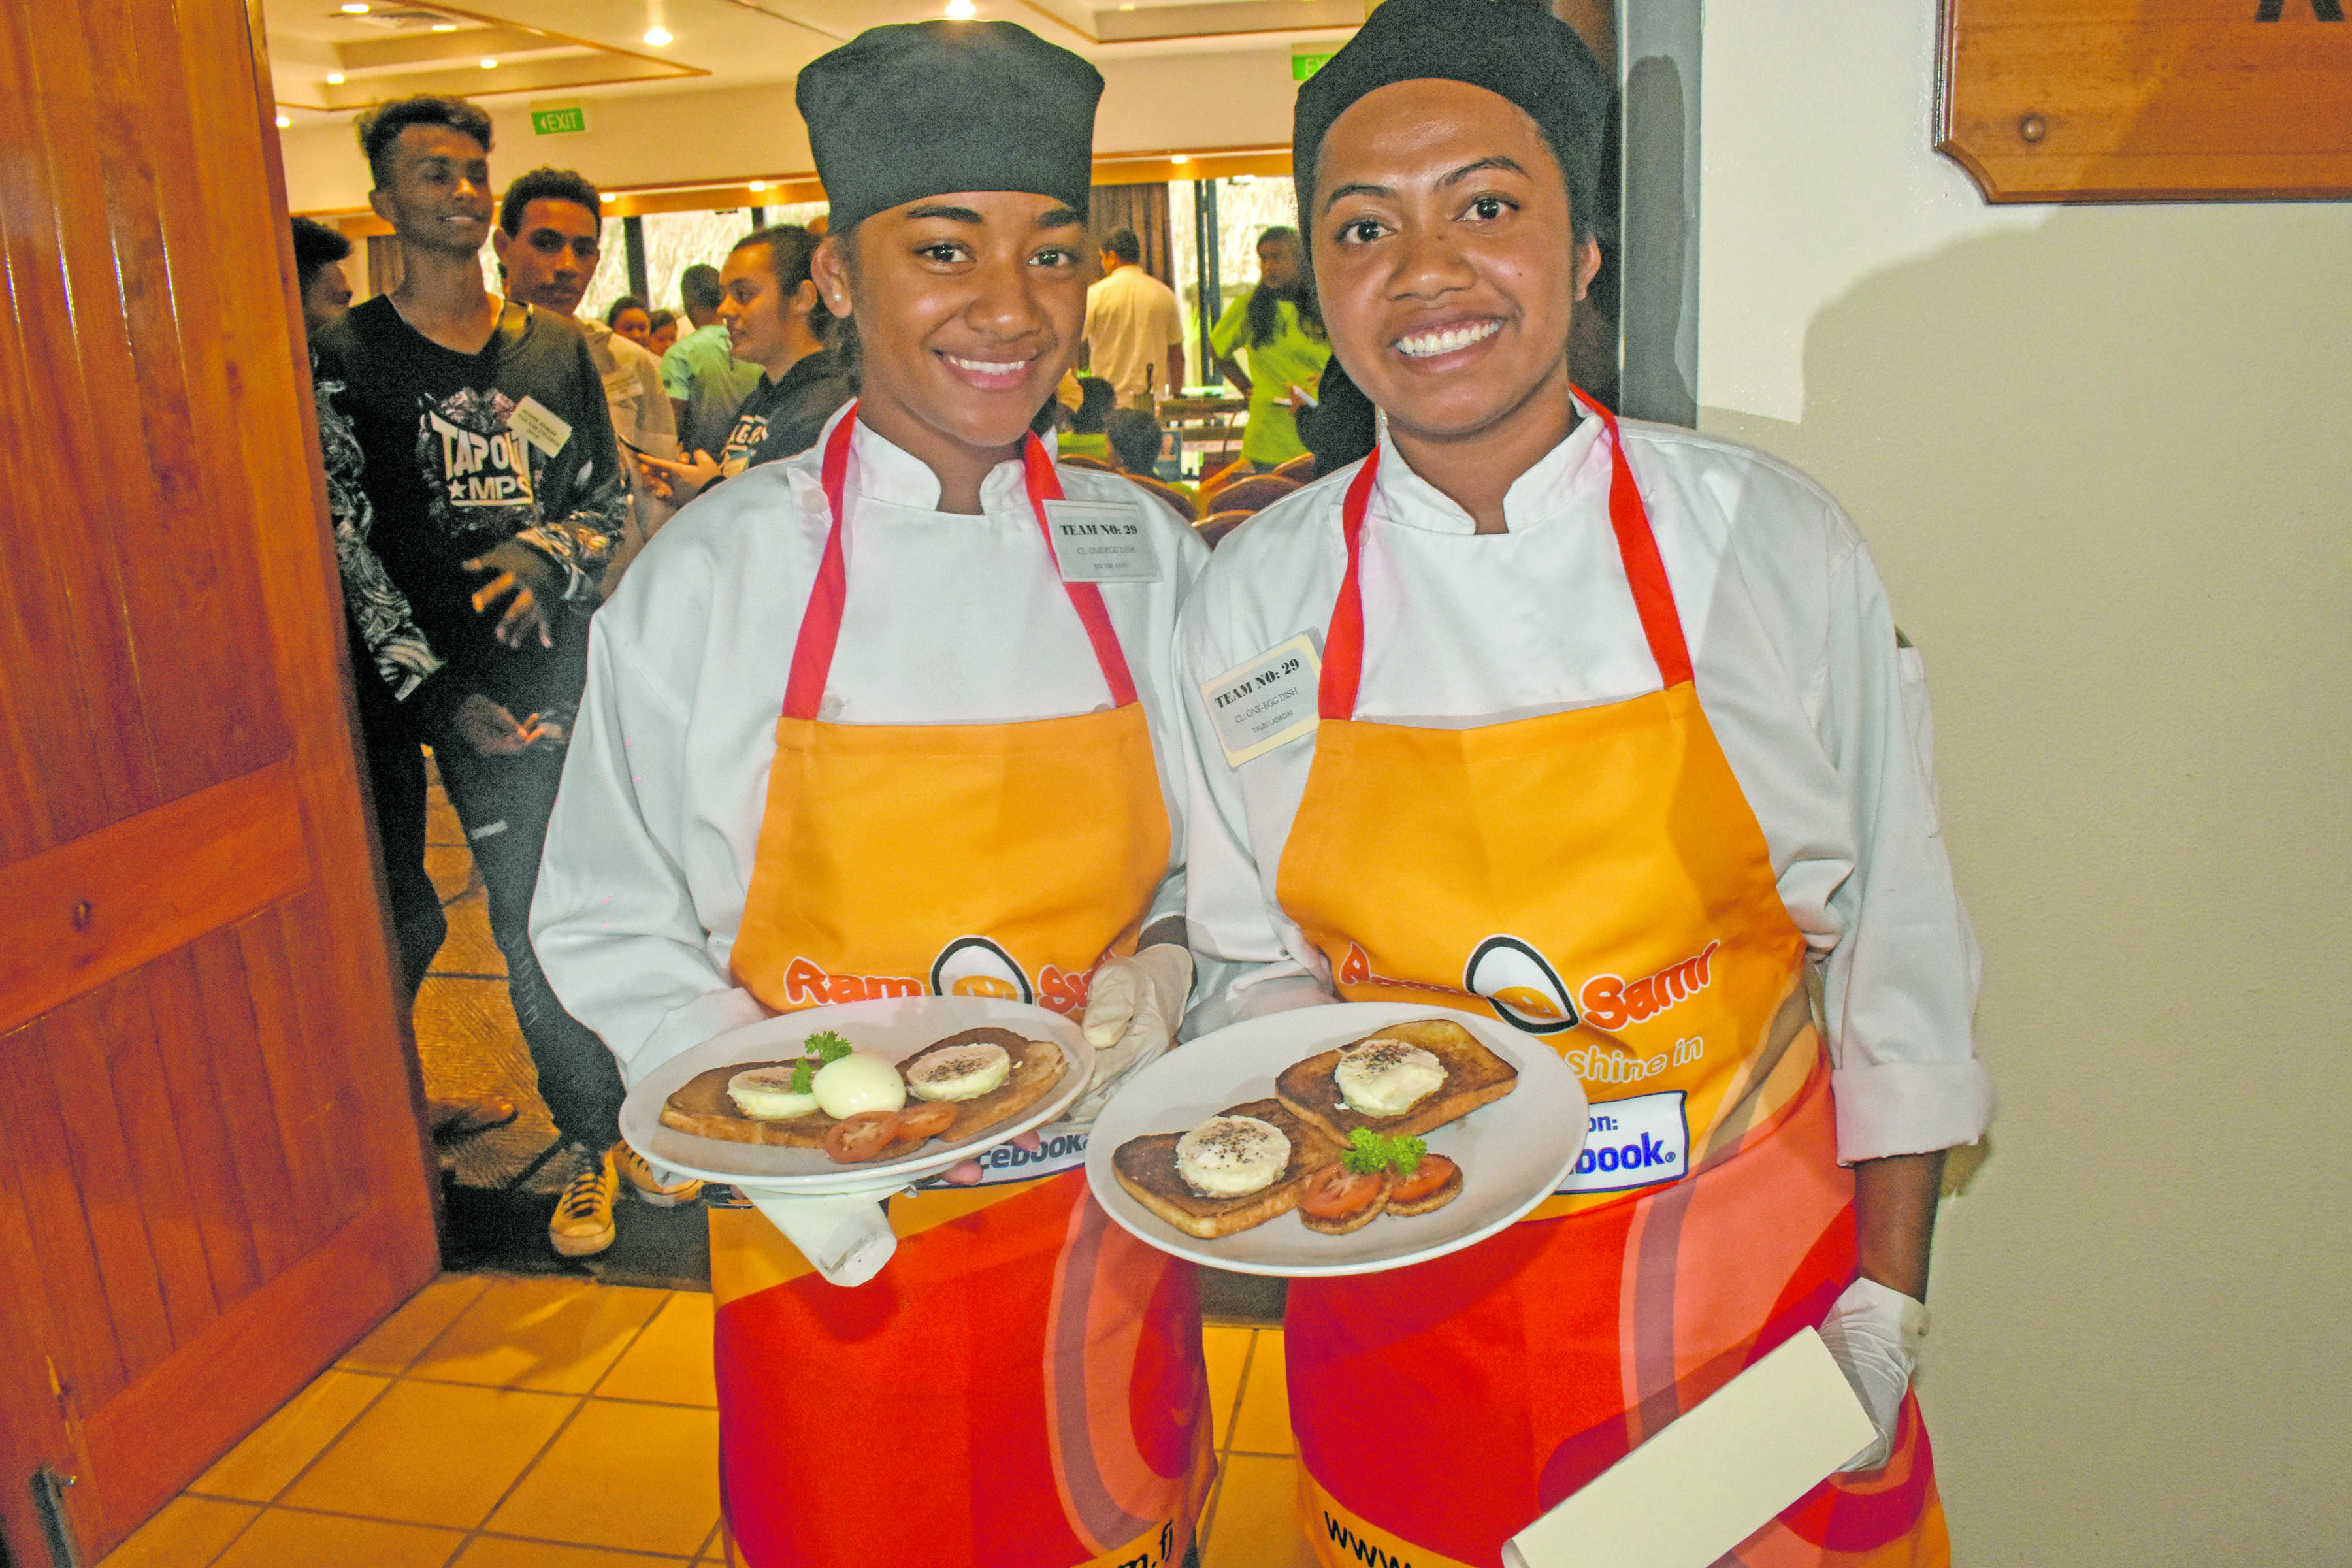 LDS Church College students Adi Emi Savu (left), and Talei Labadai with their Egg Dish the School Chef Challenge 2018 at Outrigger Fiji Beach Resort n Korolevu on July 5, 2018. Photo: Arieta Vakasukawaqa